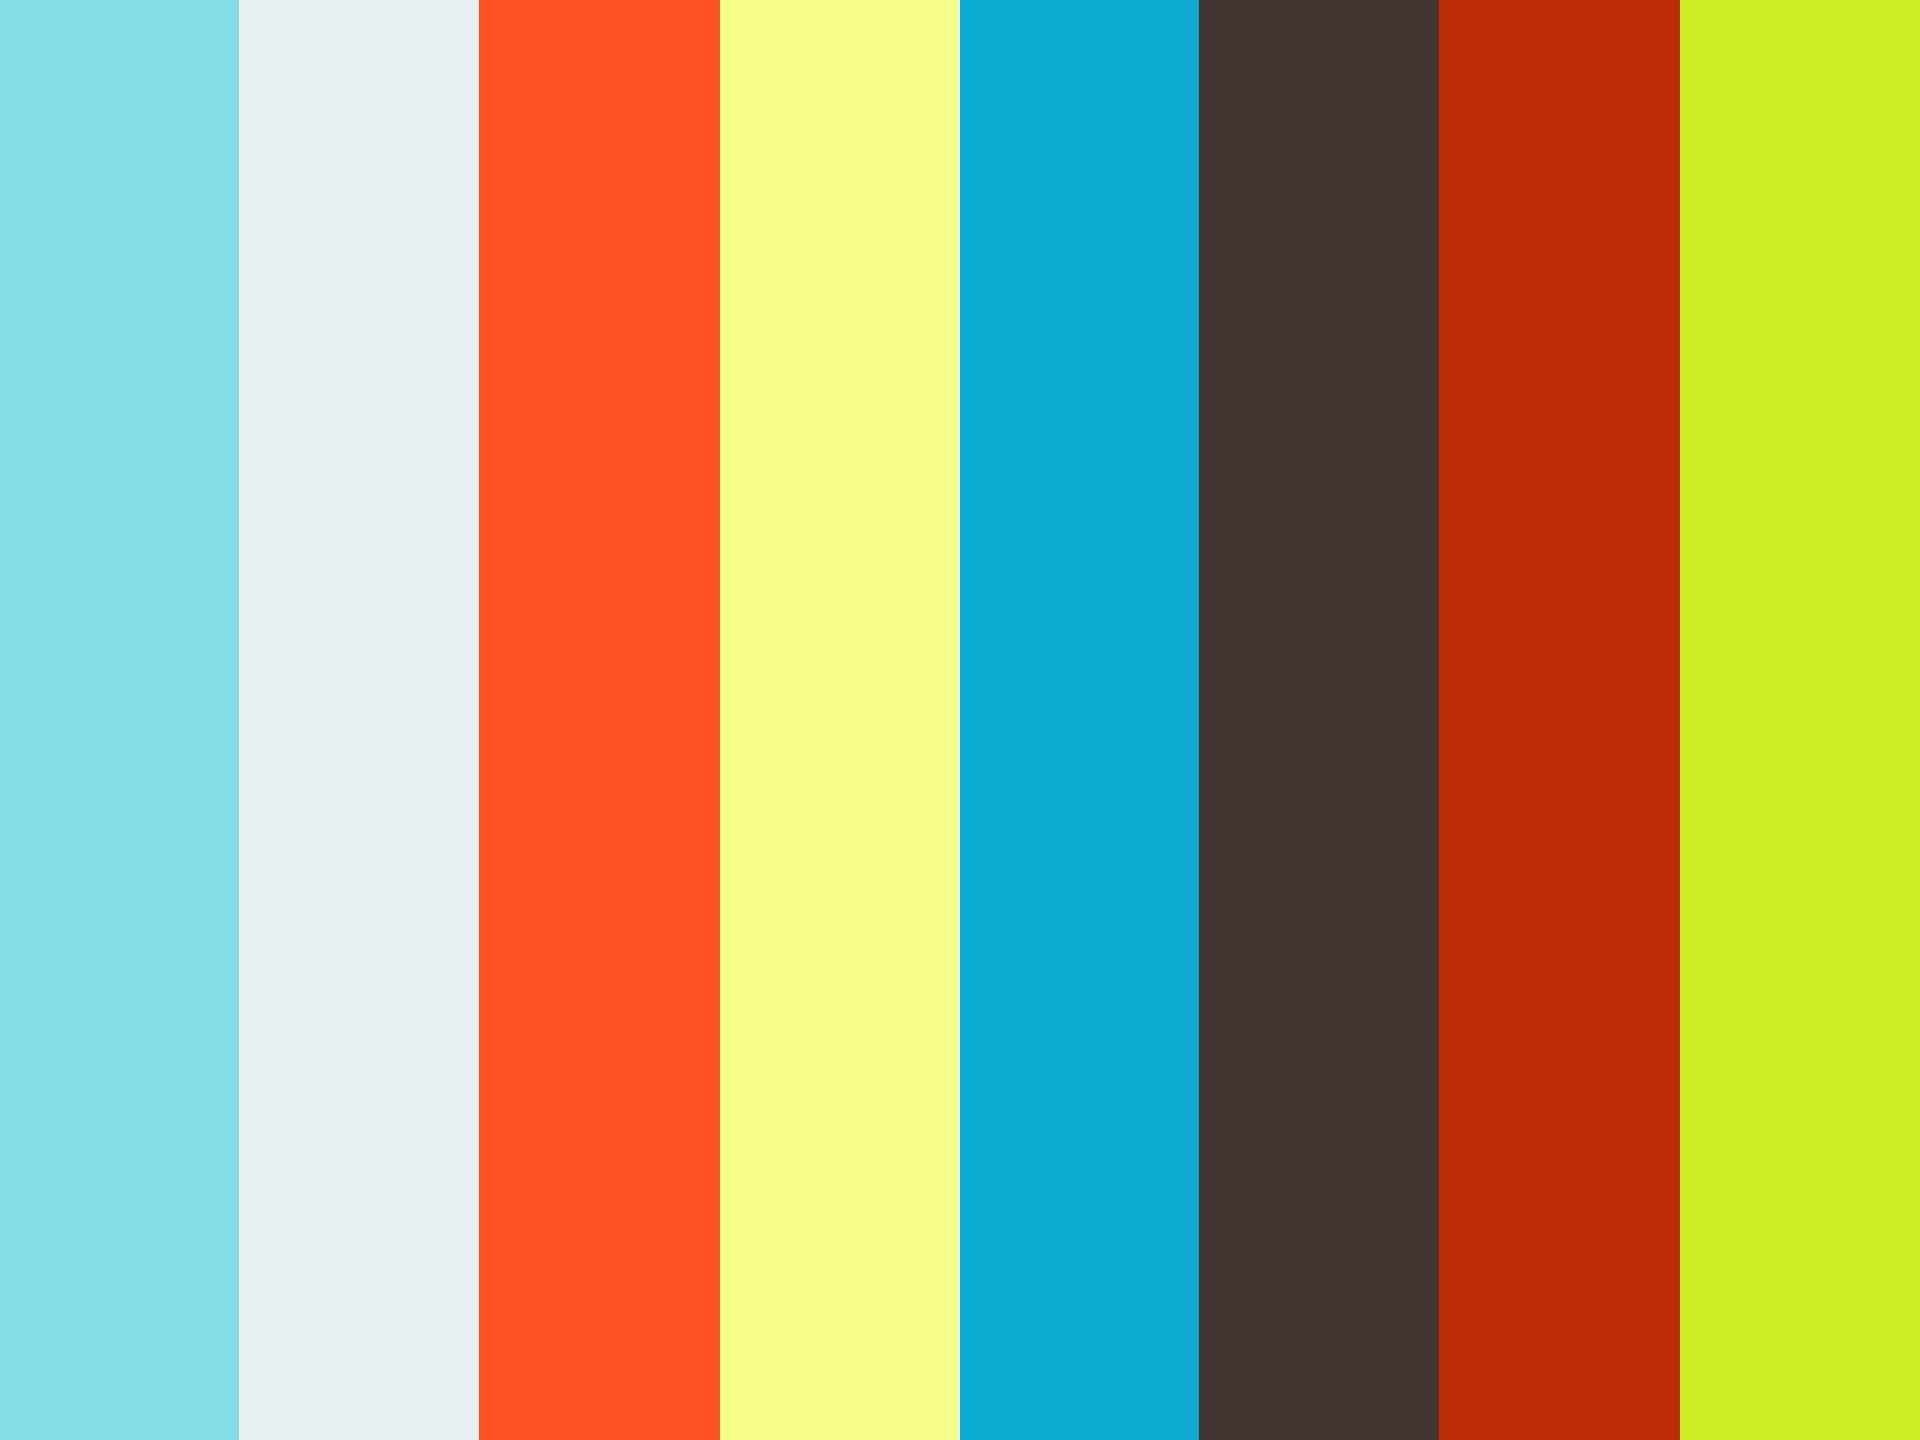 MERCEDES BENZ GLC 63 - WHITE - 2017